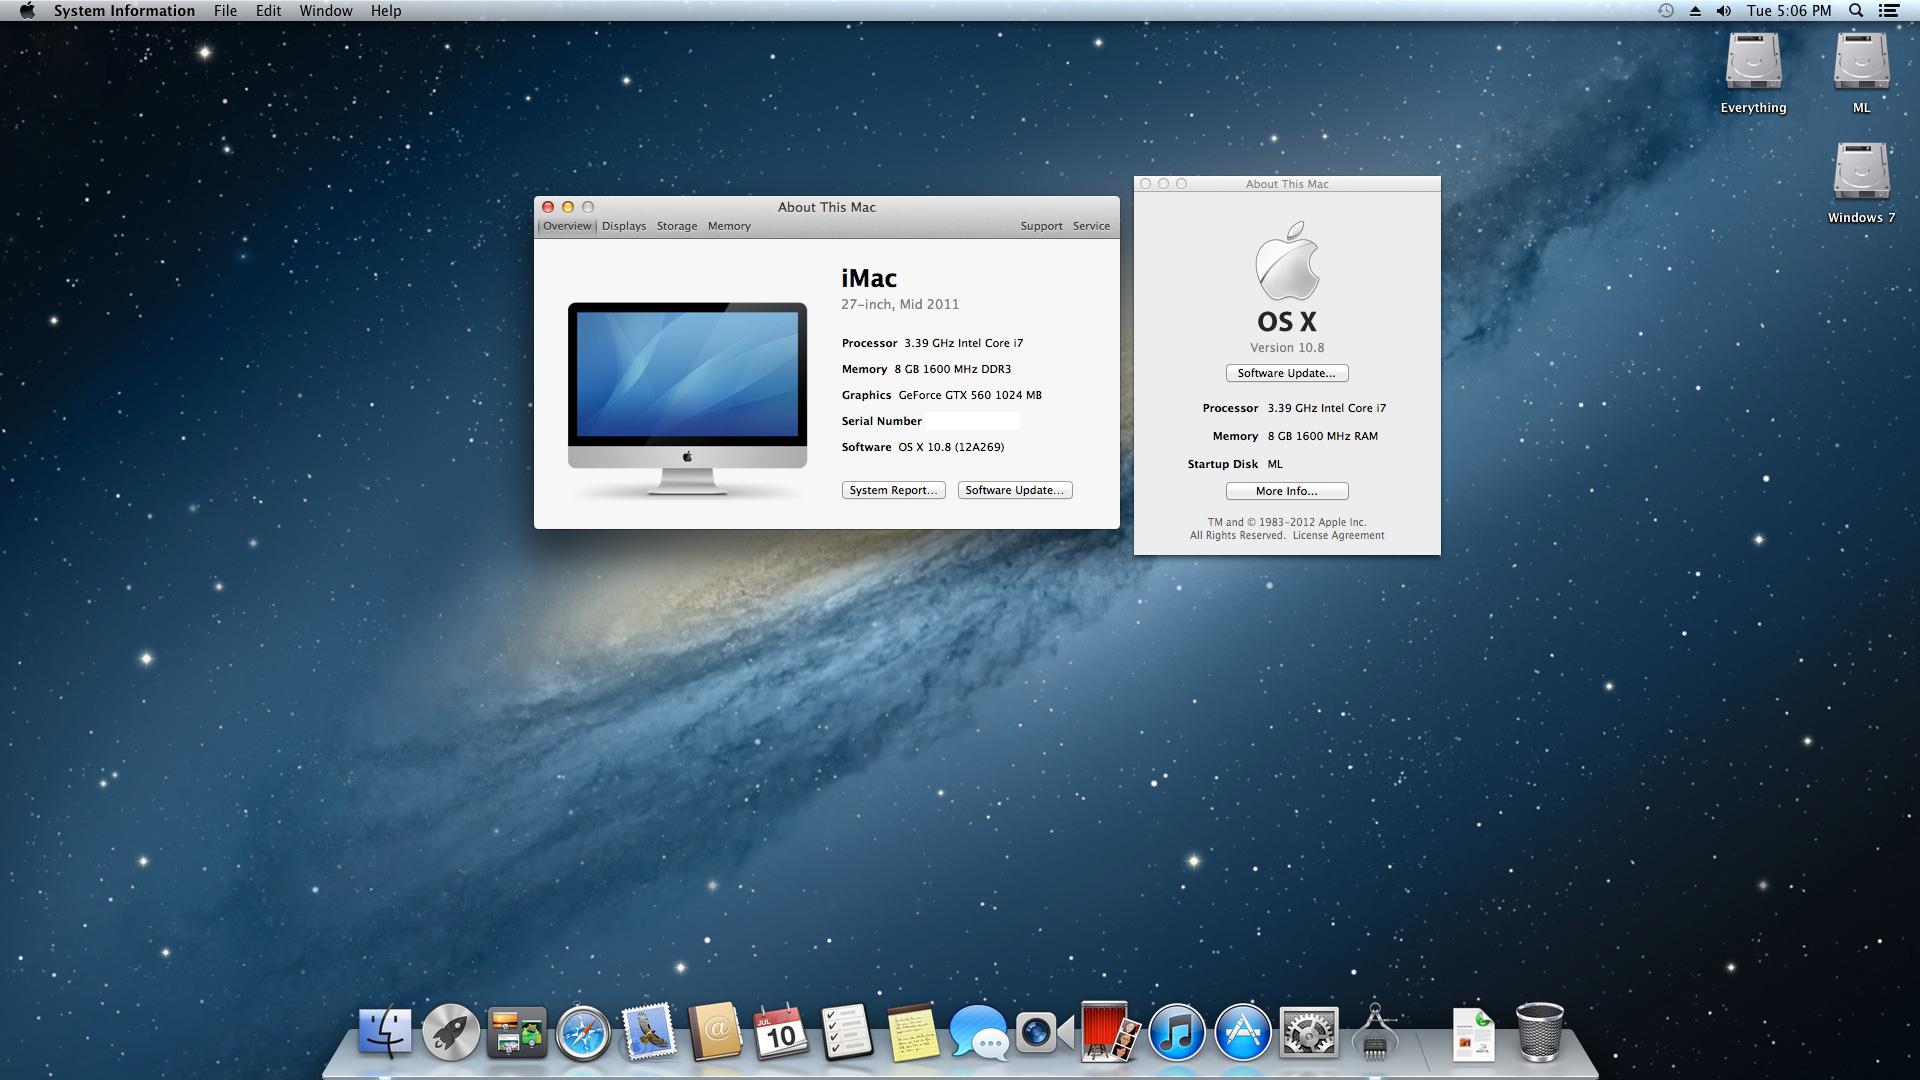 mac os x lion 10.8_[Tutorial] Run OS X Mountain Lion 10.8 on a PC (Hackintosh/OSx86) – Gadget Unit